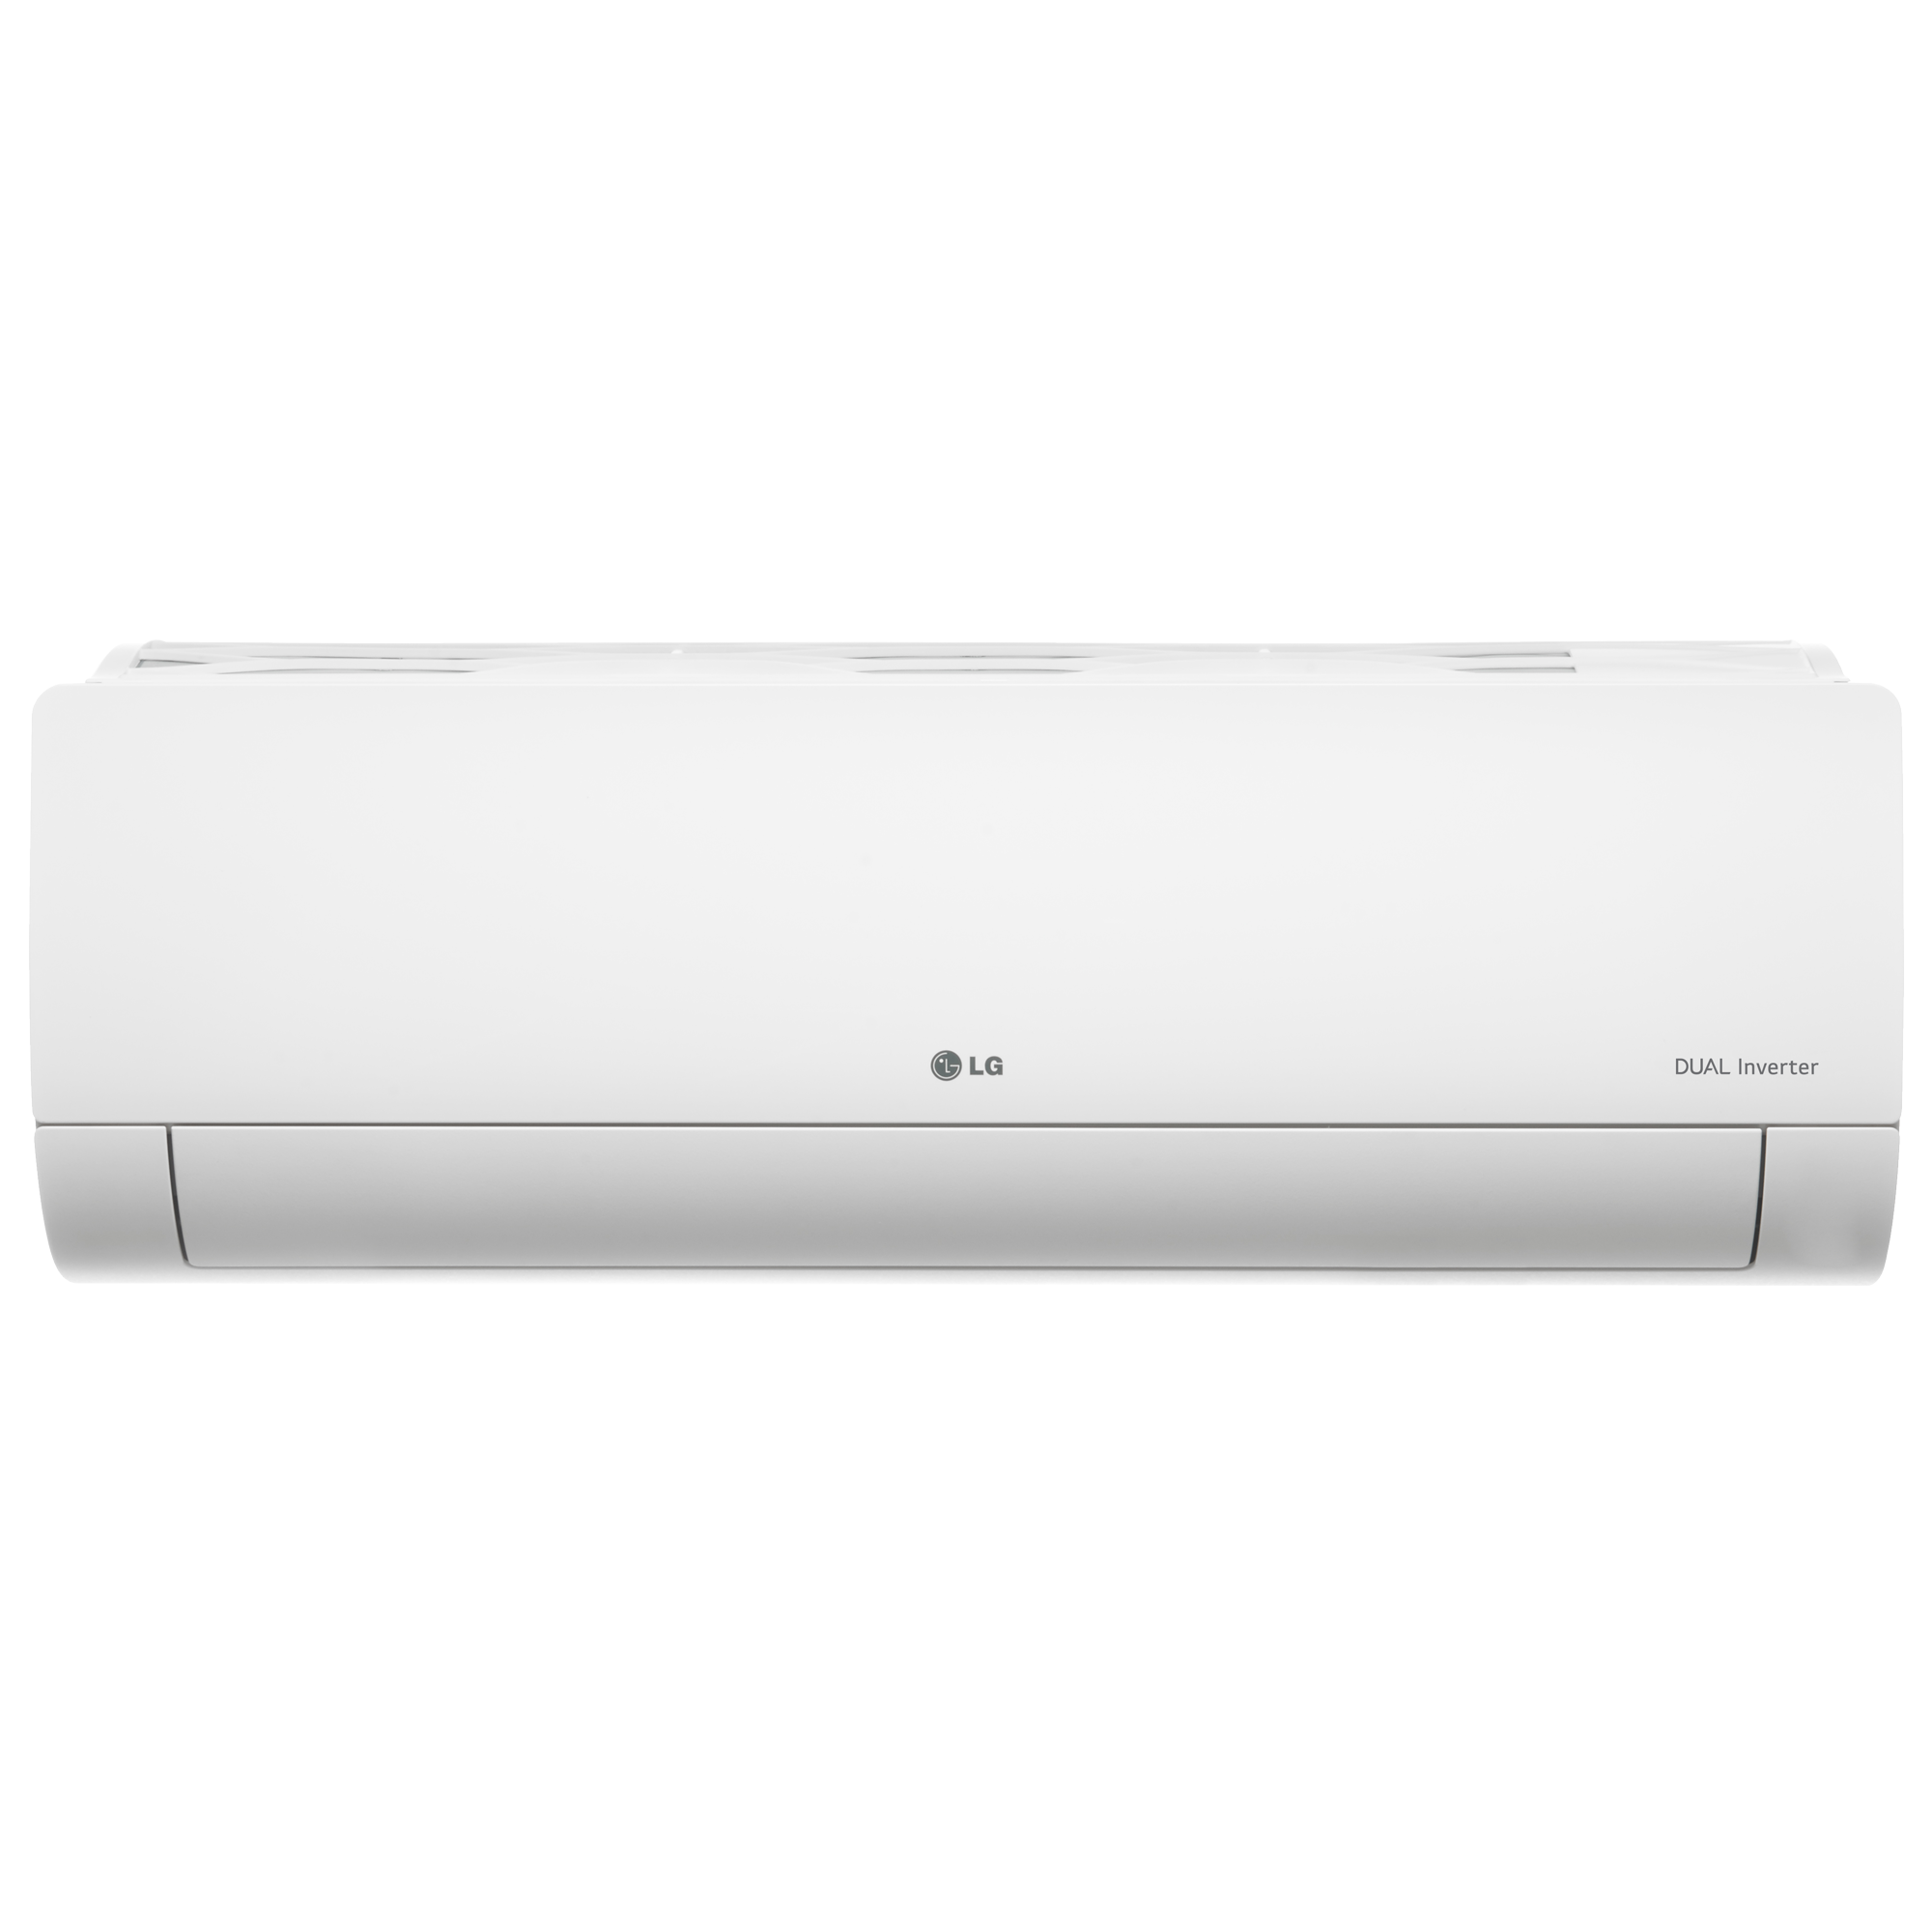 LG 1 Ton 4 Star Inverter Split AC (Air Purification Filter, Copper Condenser, MS-Q12ANYA, White)_1